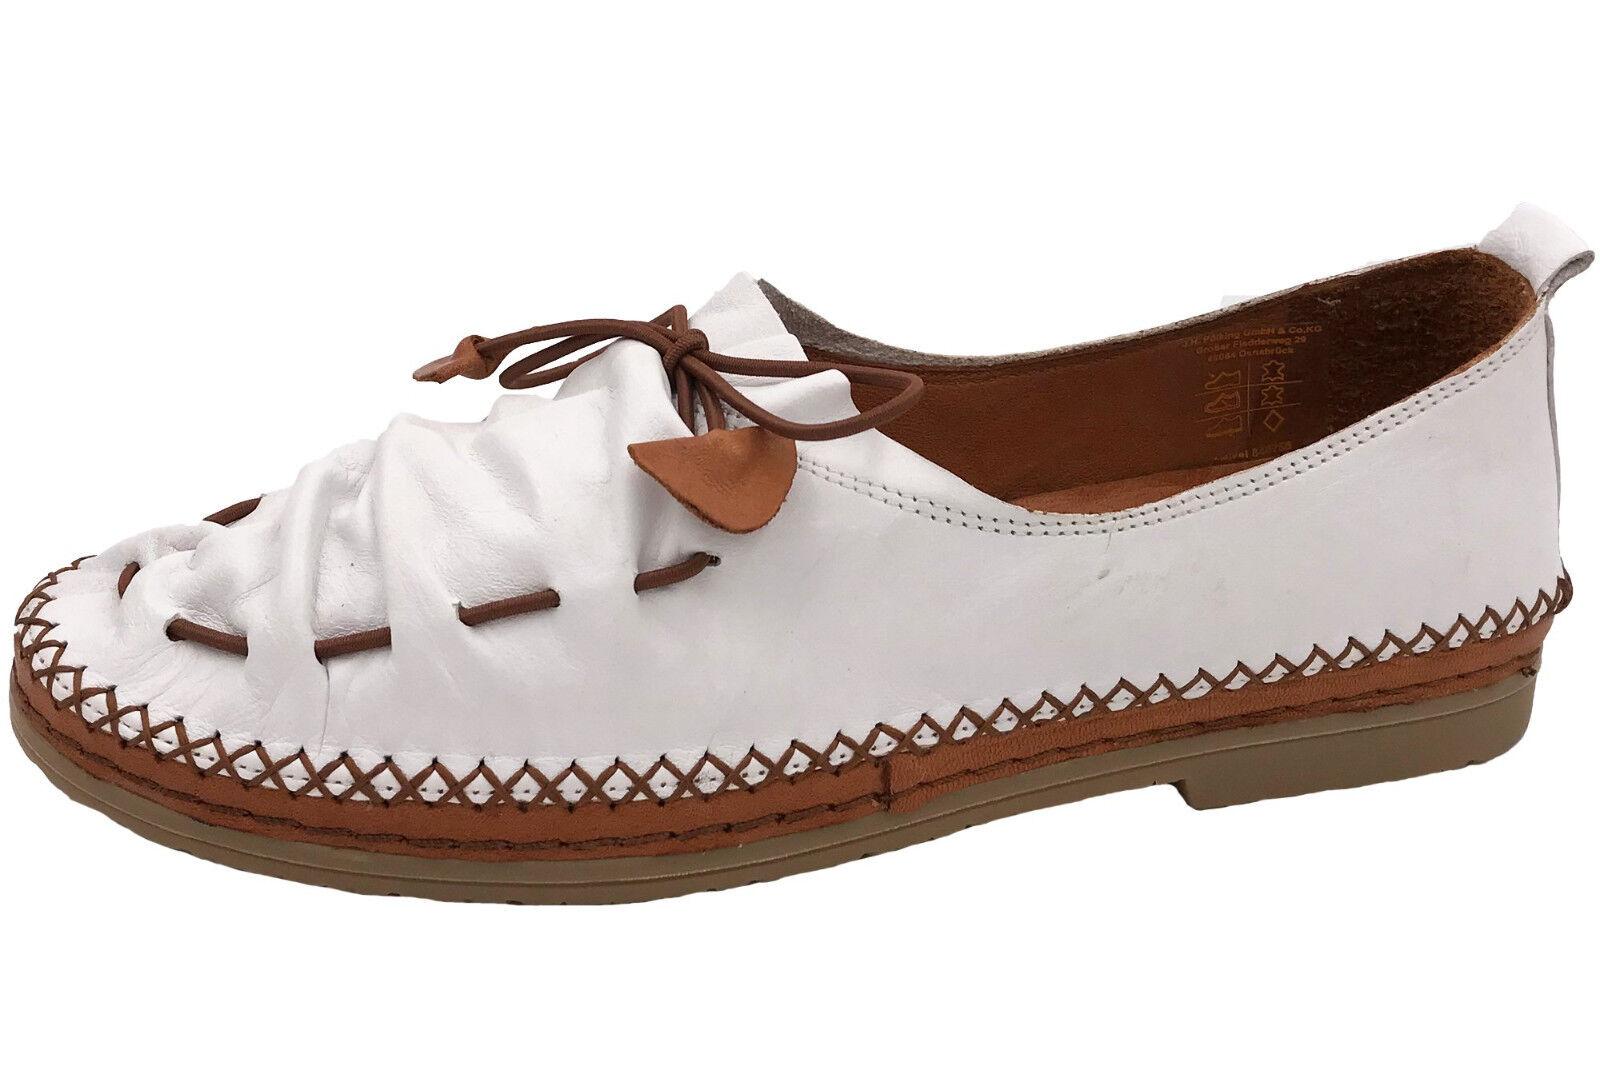 Manitu Damen Schuhe Weiß Mokassins Leder Slipper NEU 840755-3 NEU